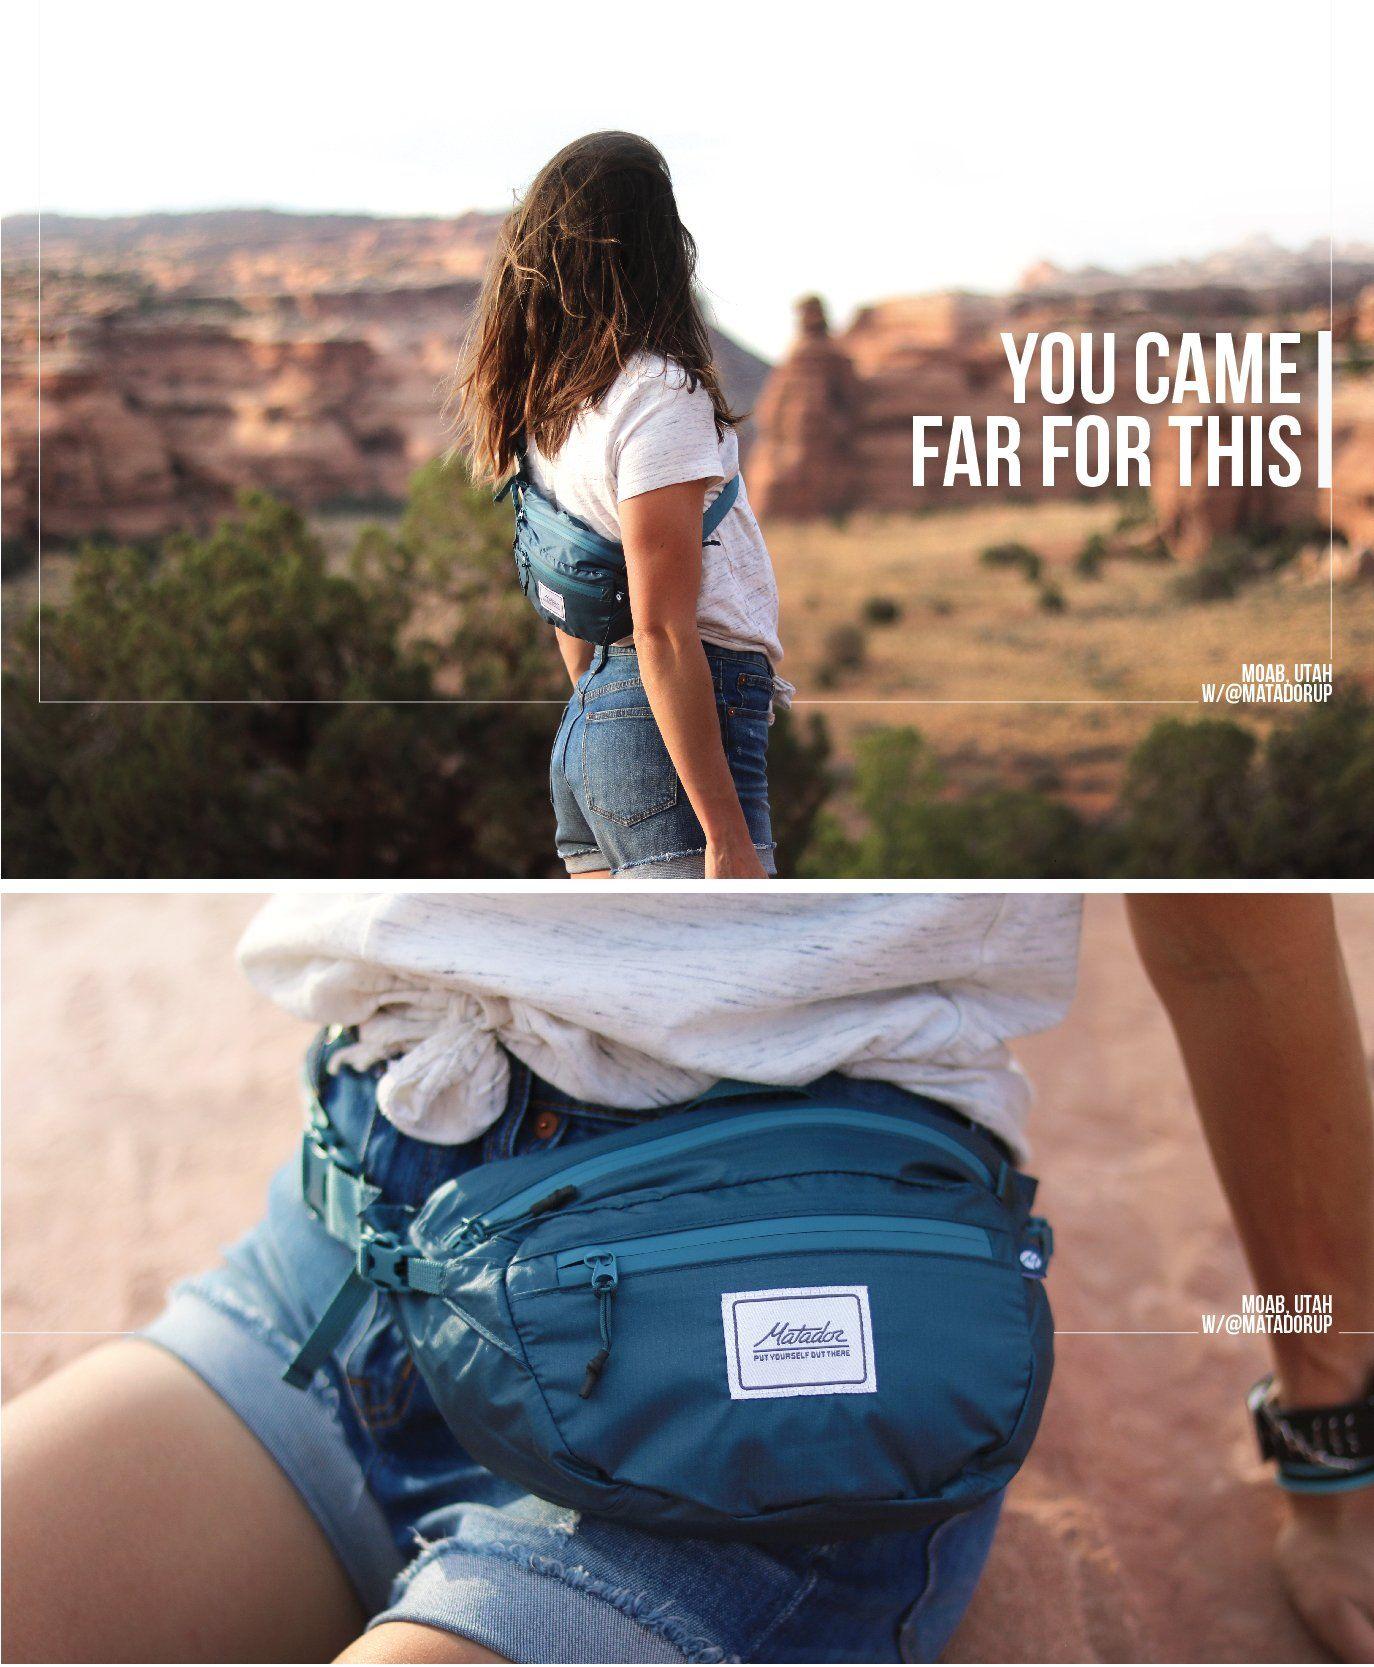 Hip Pack Want Pinterest Camping Matador Flatpak Toiletry Bottle 1